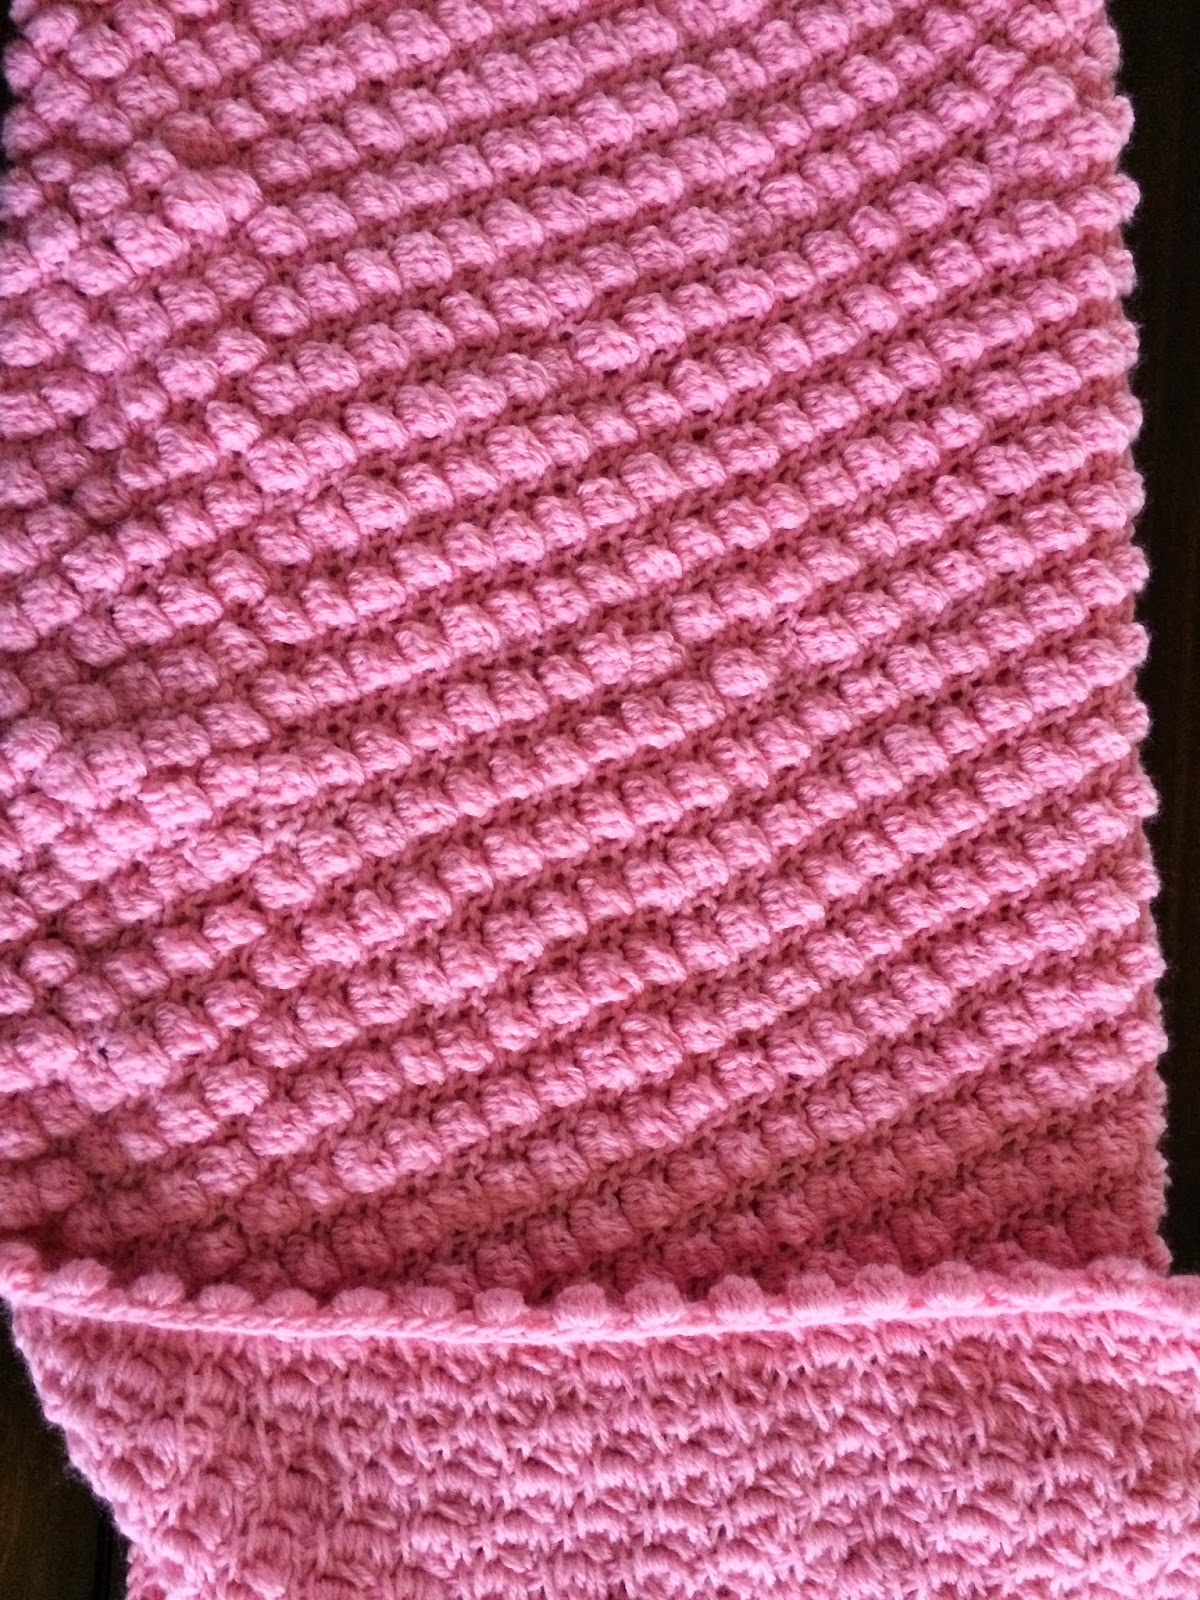 Tunisian Crochet Puff Stitch Baby Blanket - Free Pattern ...